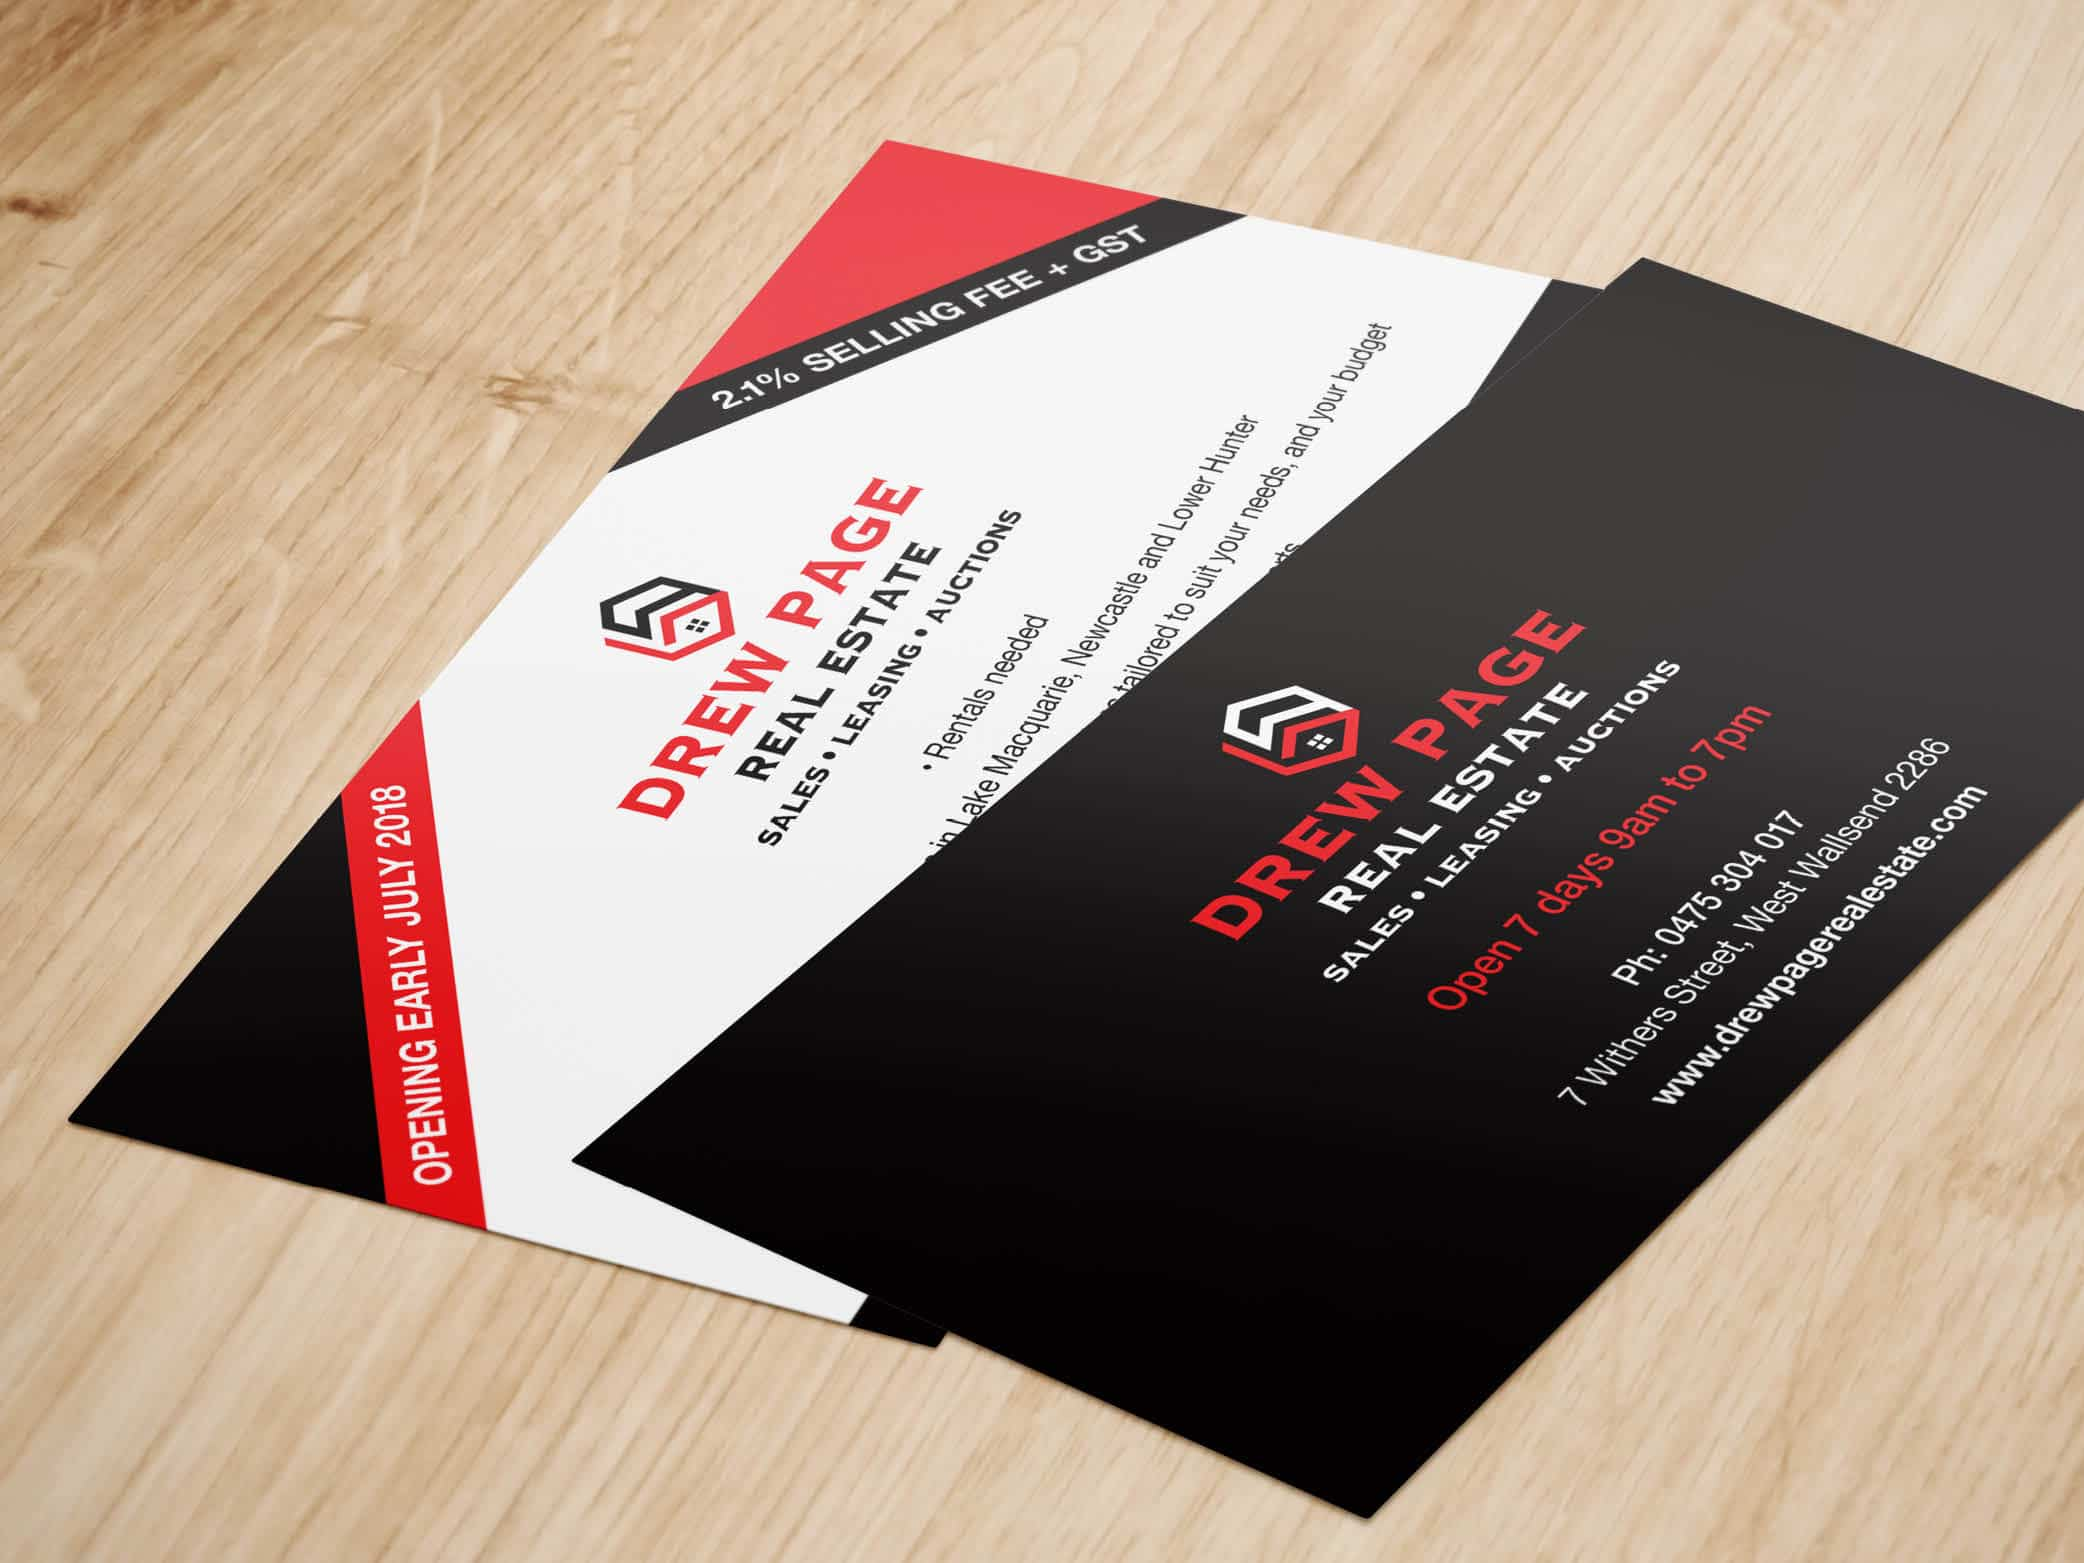 Mr Print and Design